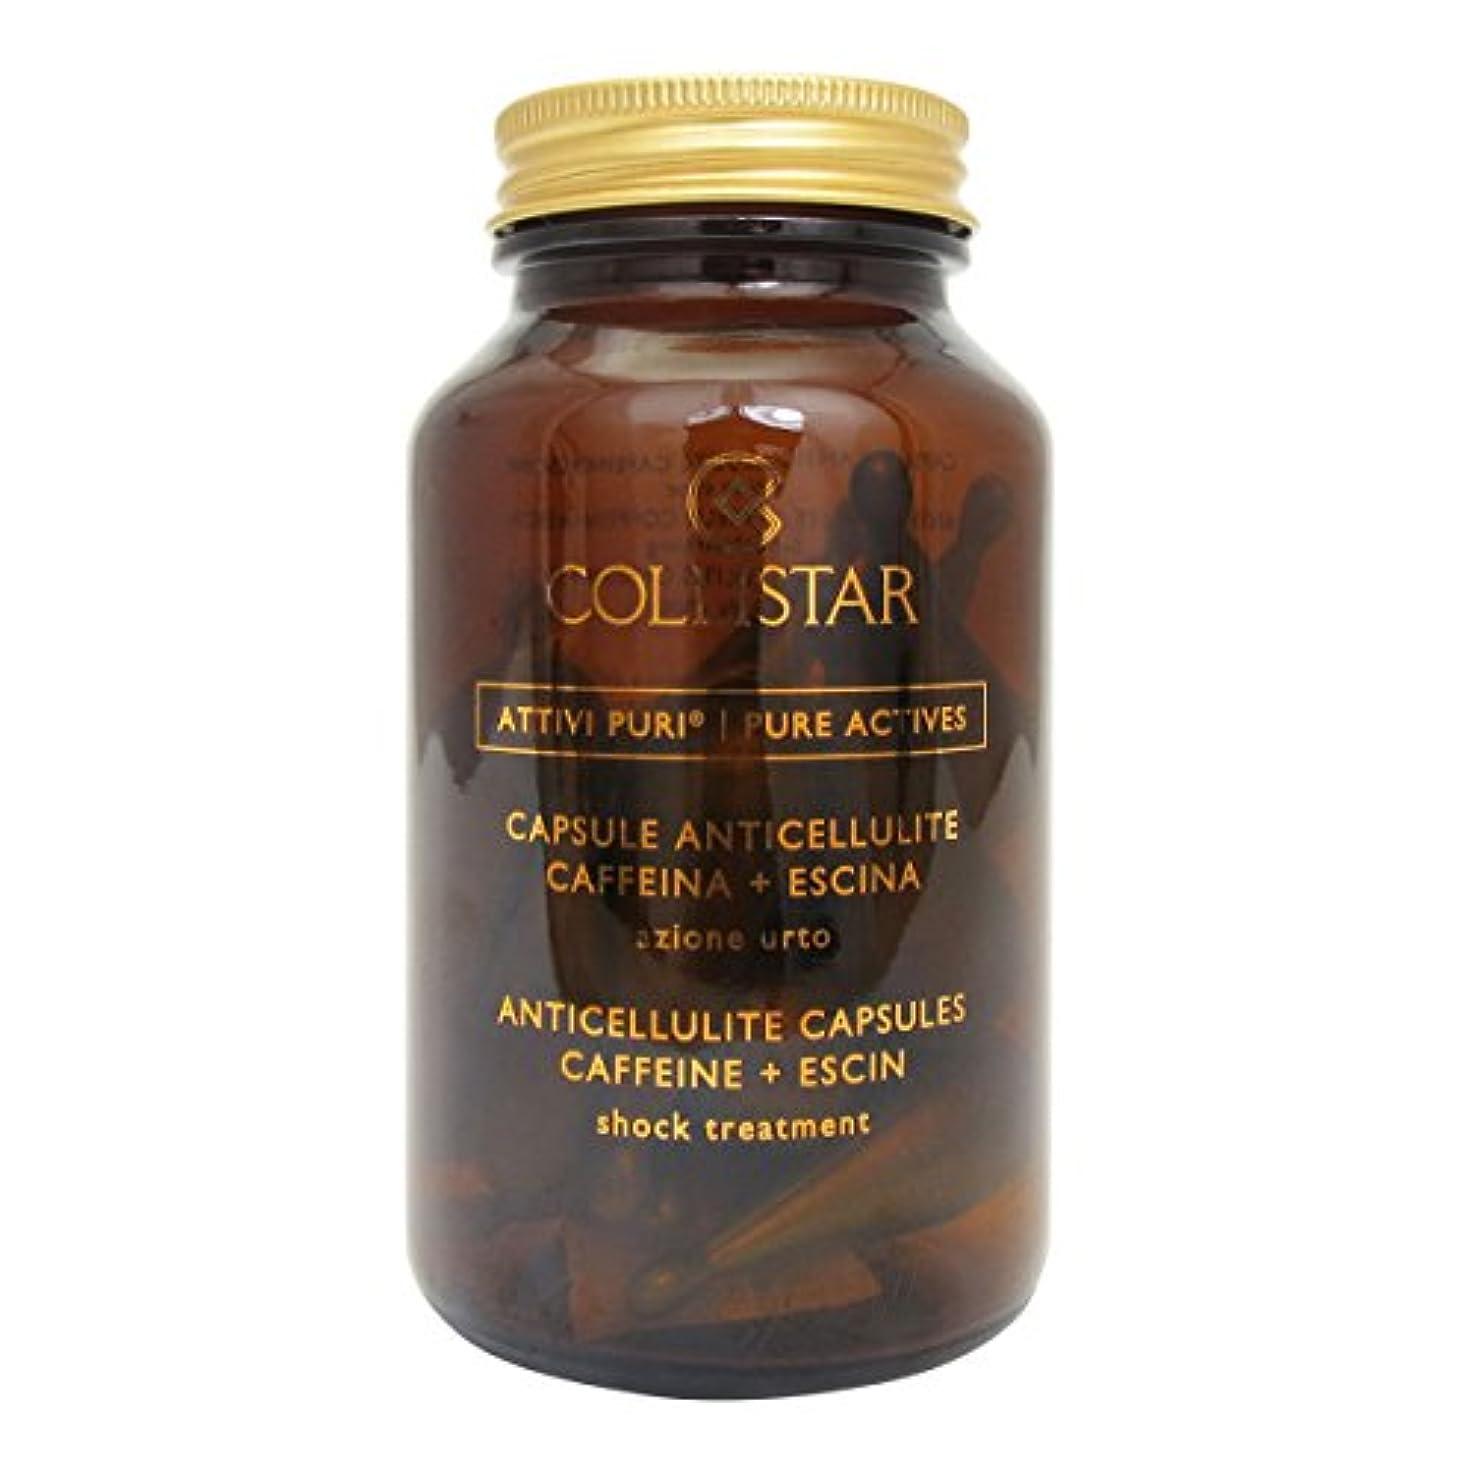 小屋暴力六月Collistar Anticellulite Capsules Caffeine+ Escin 14 Capsules [並行輸入品]